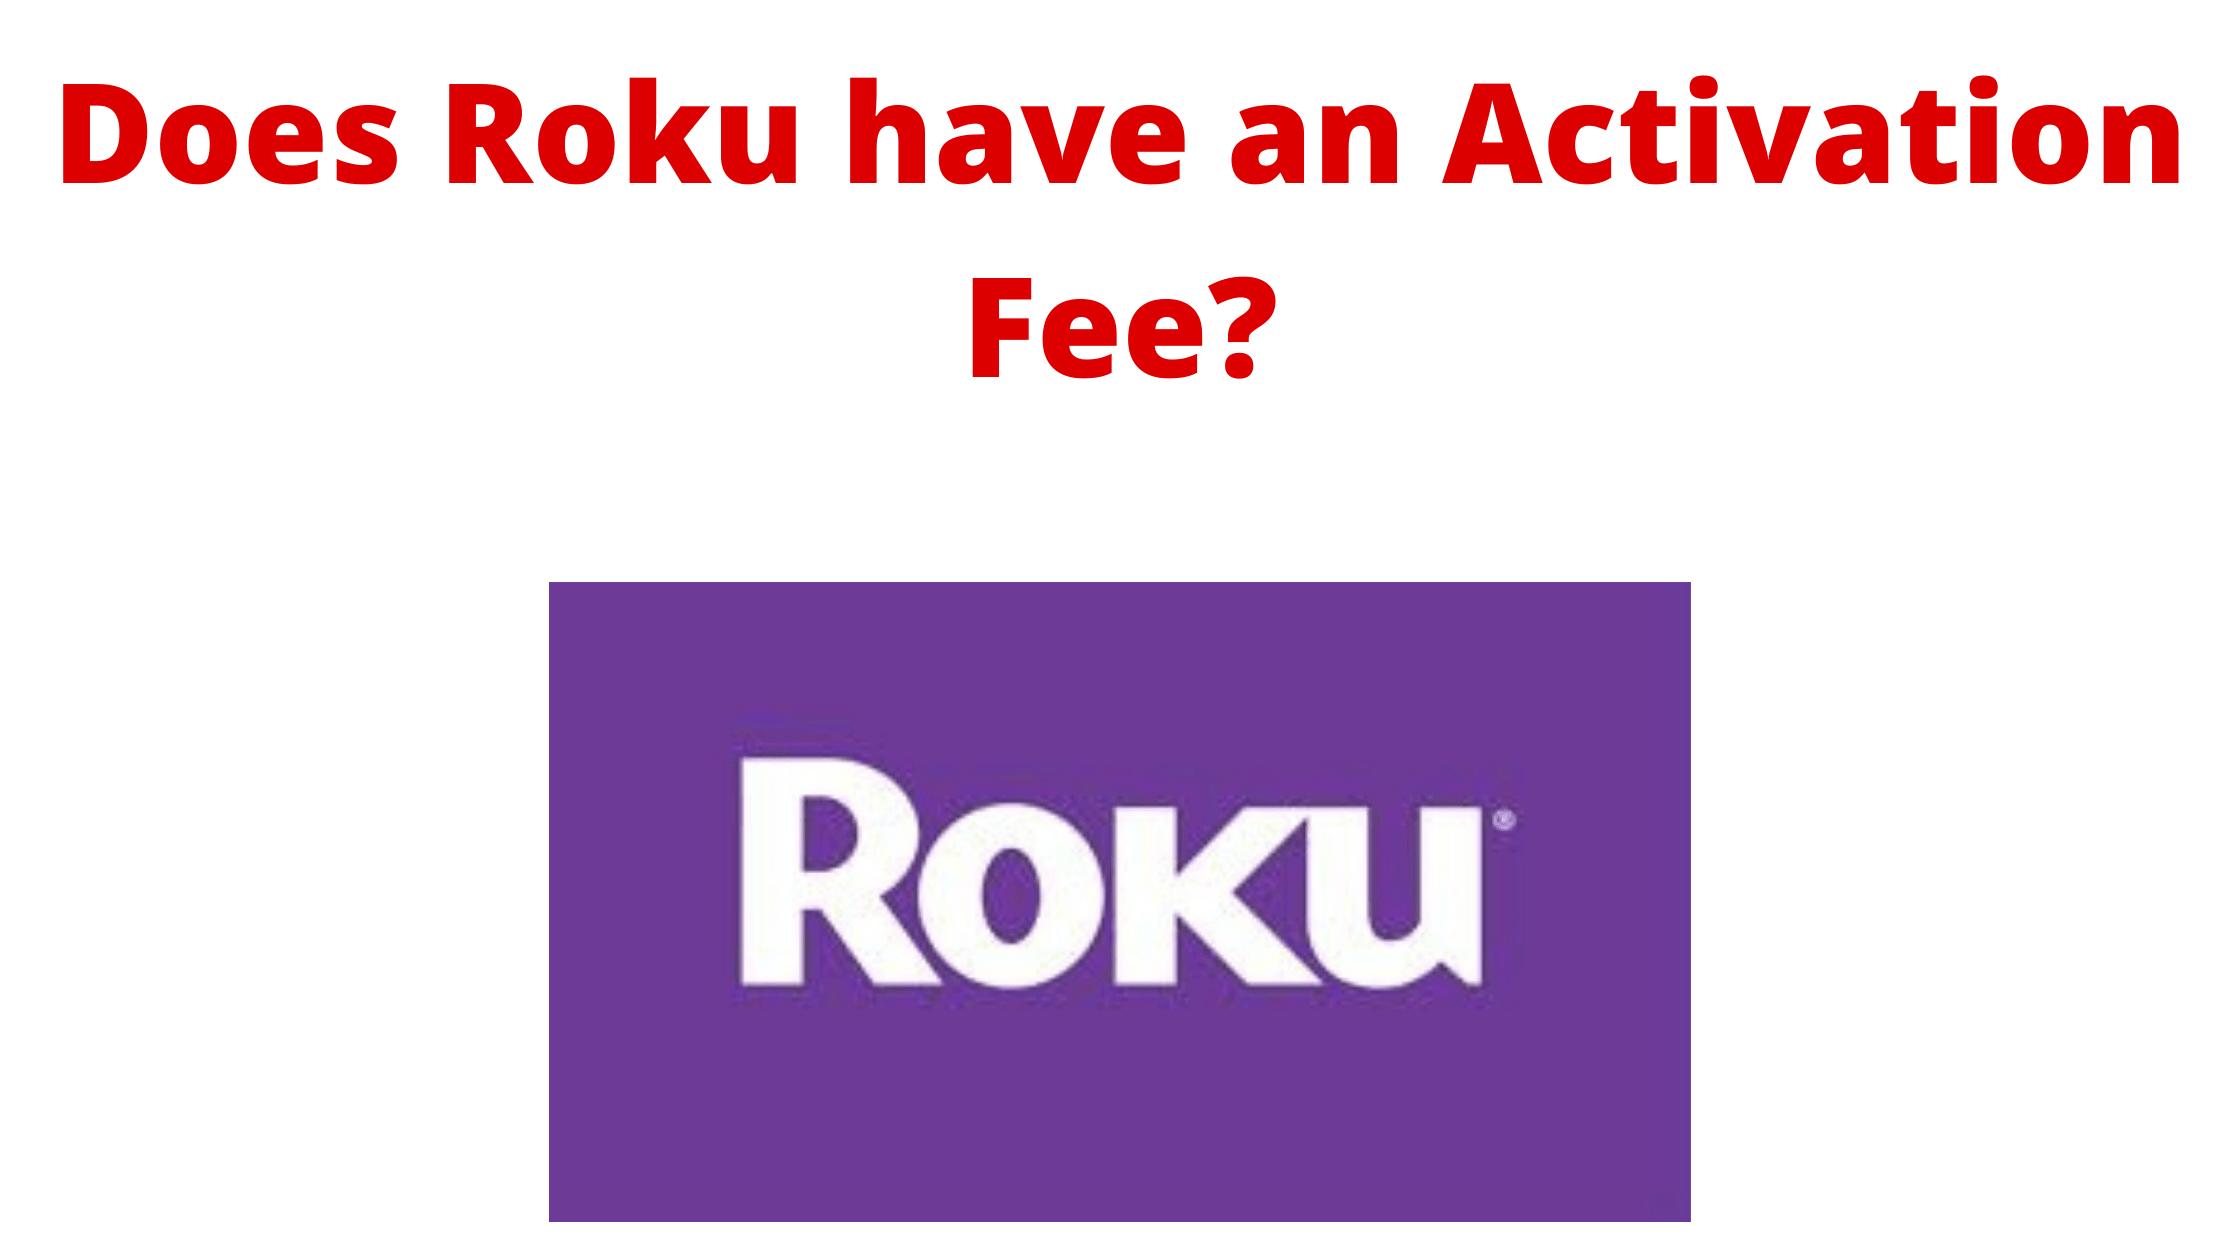 Roku Activation Fee